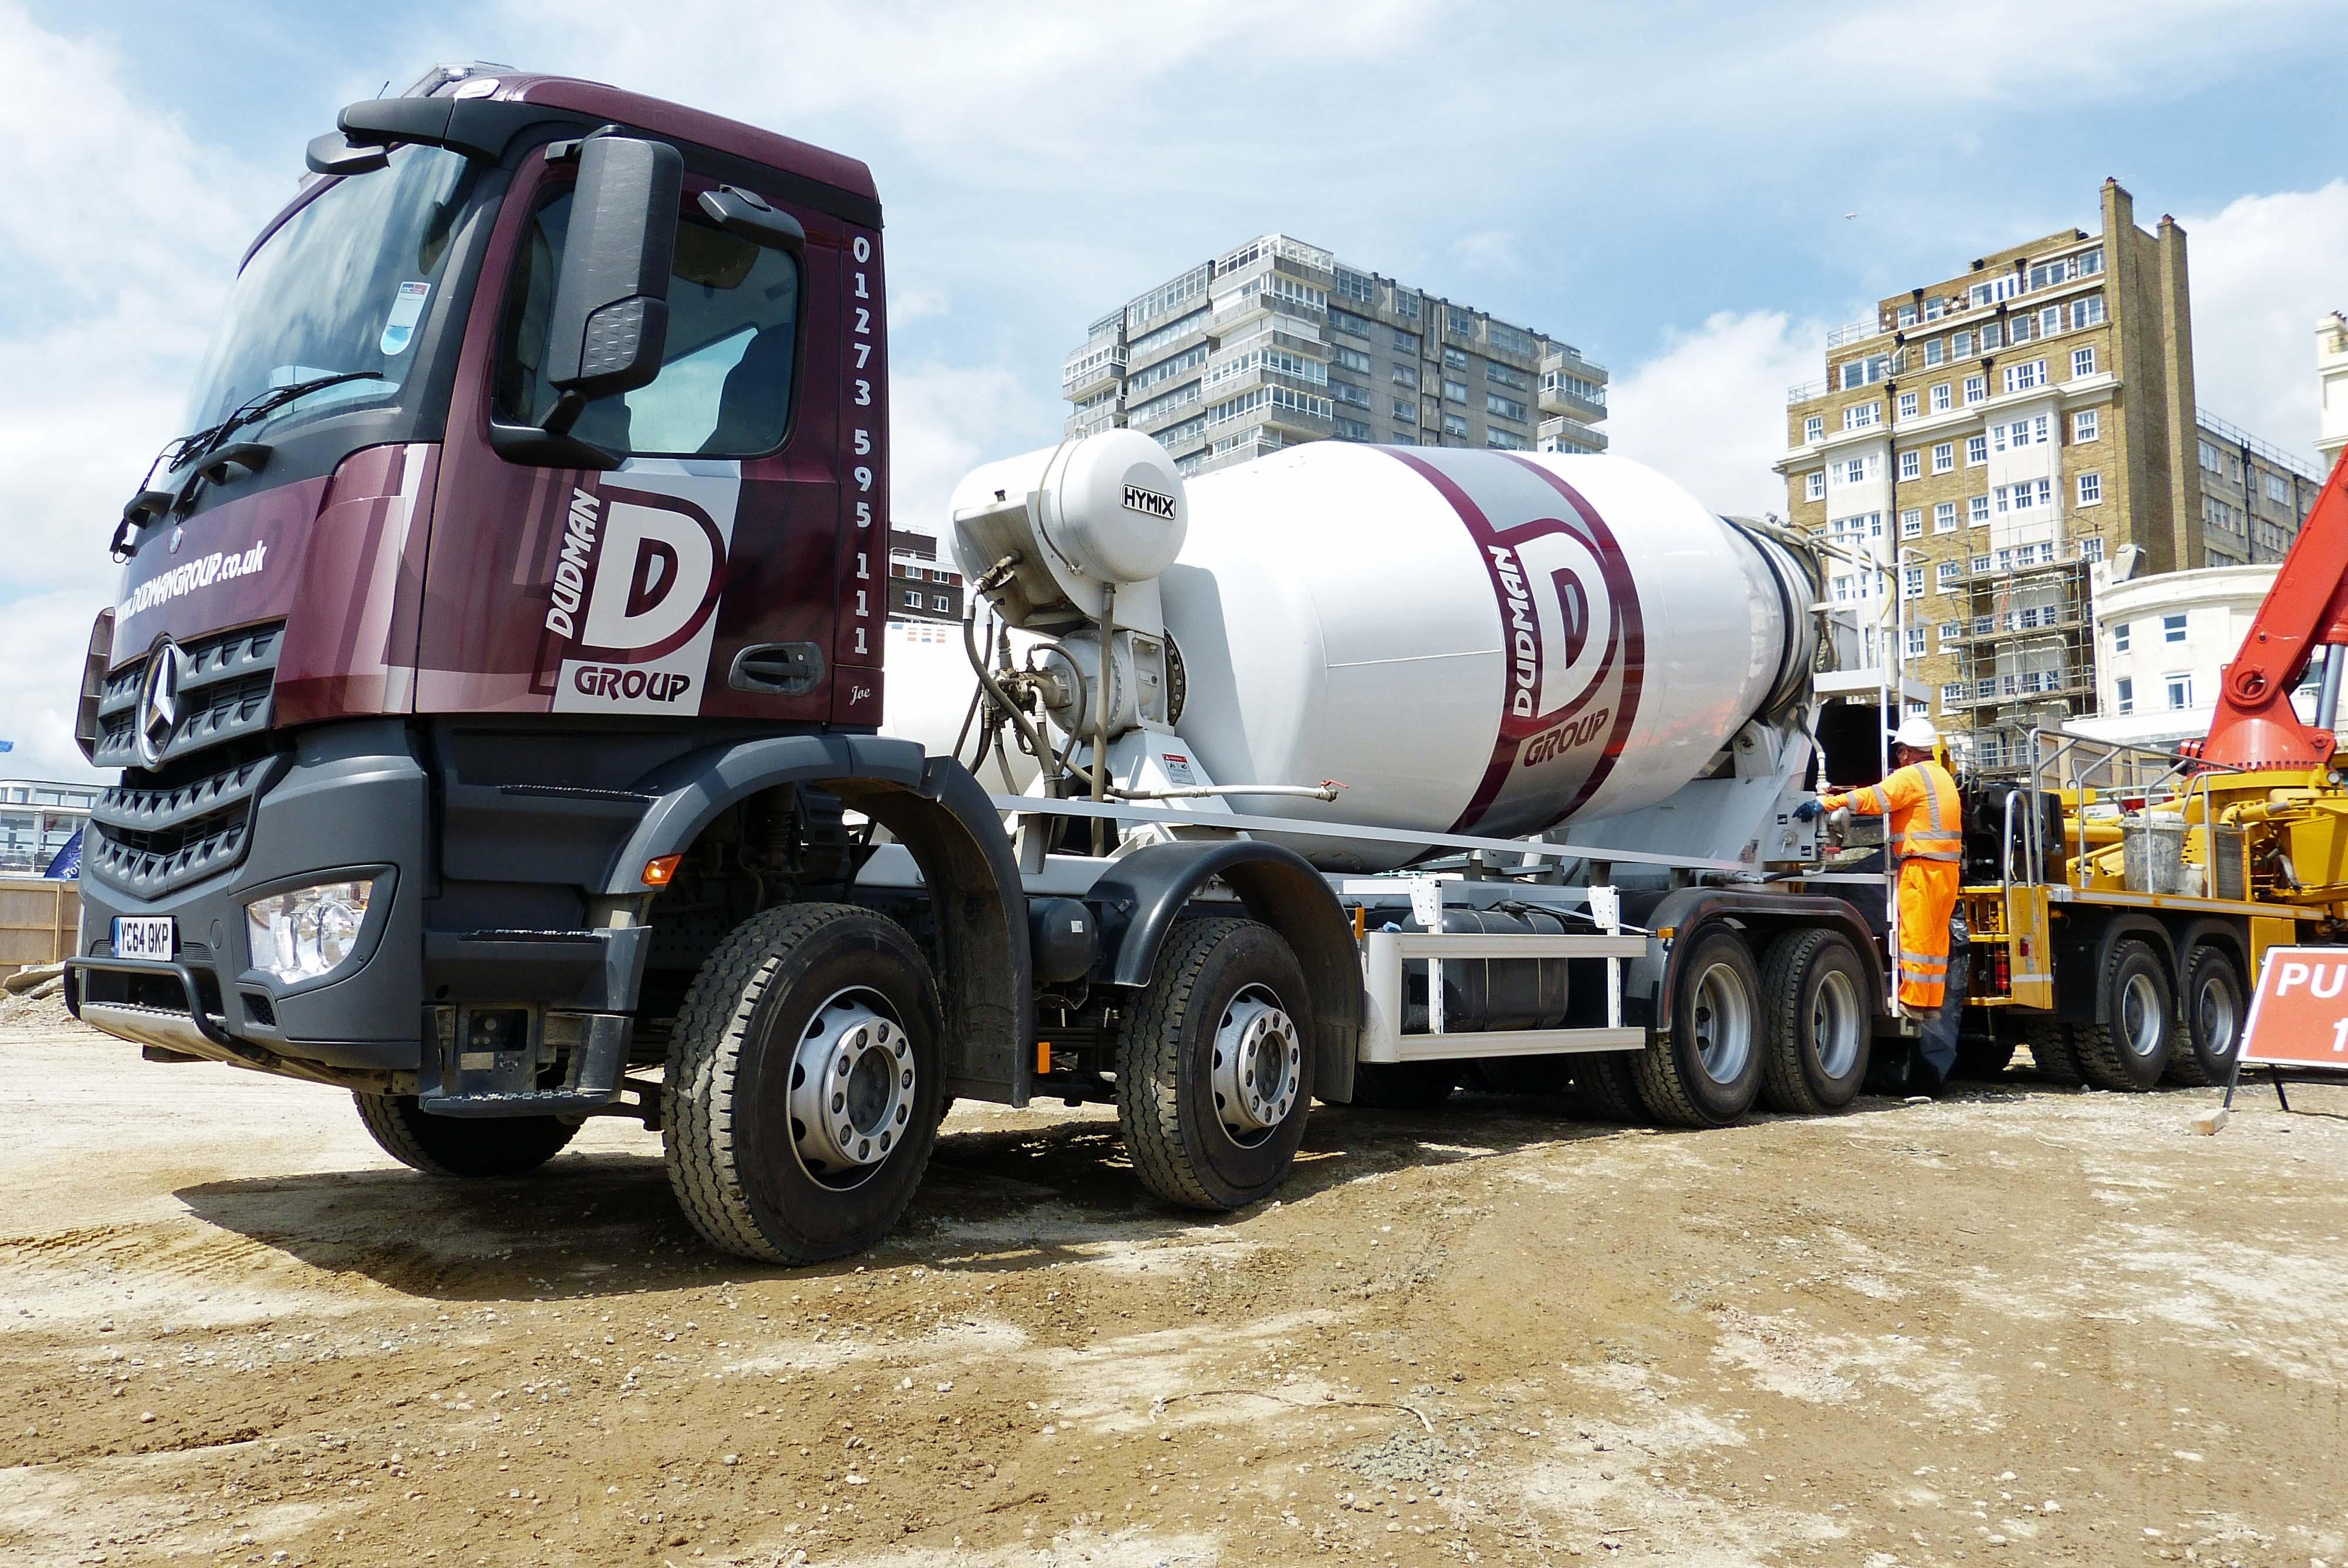 Dudman concrete mixer